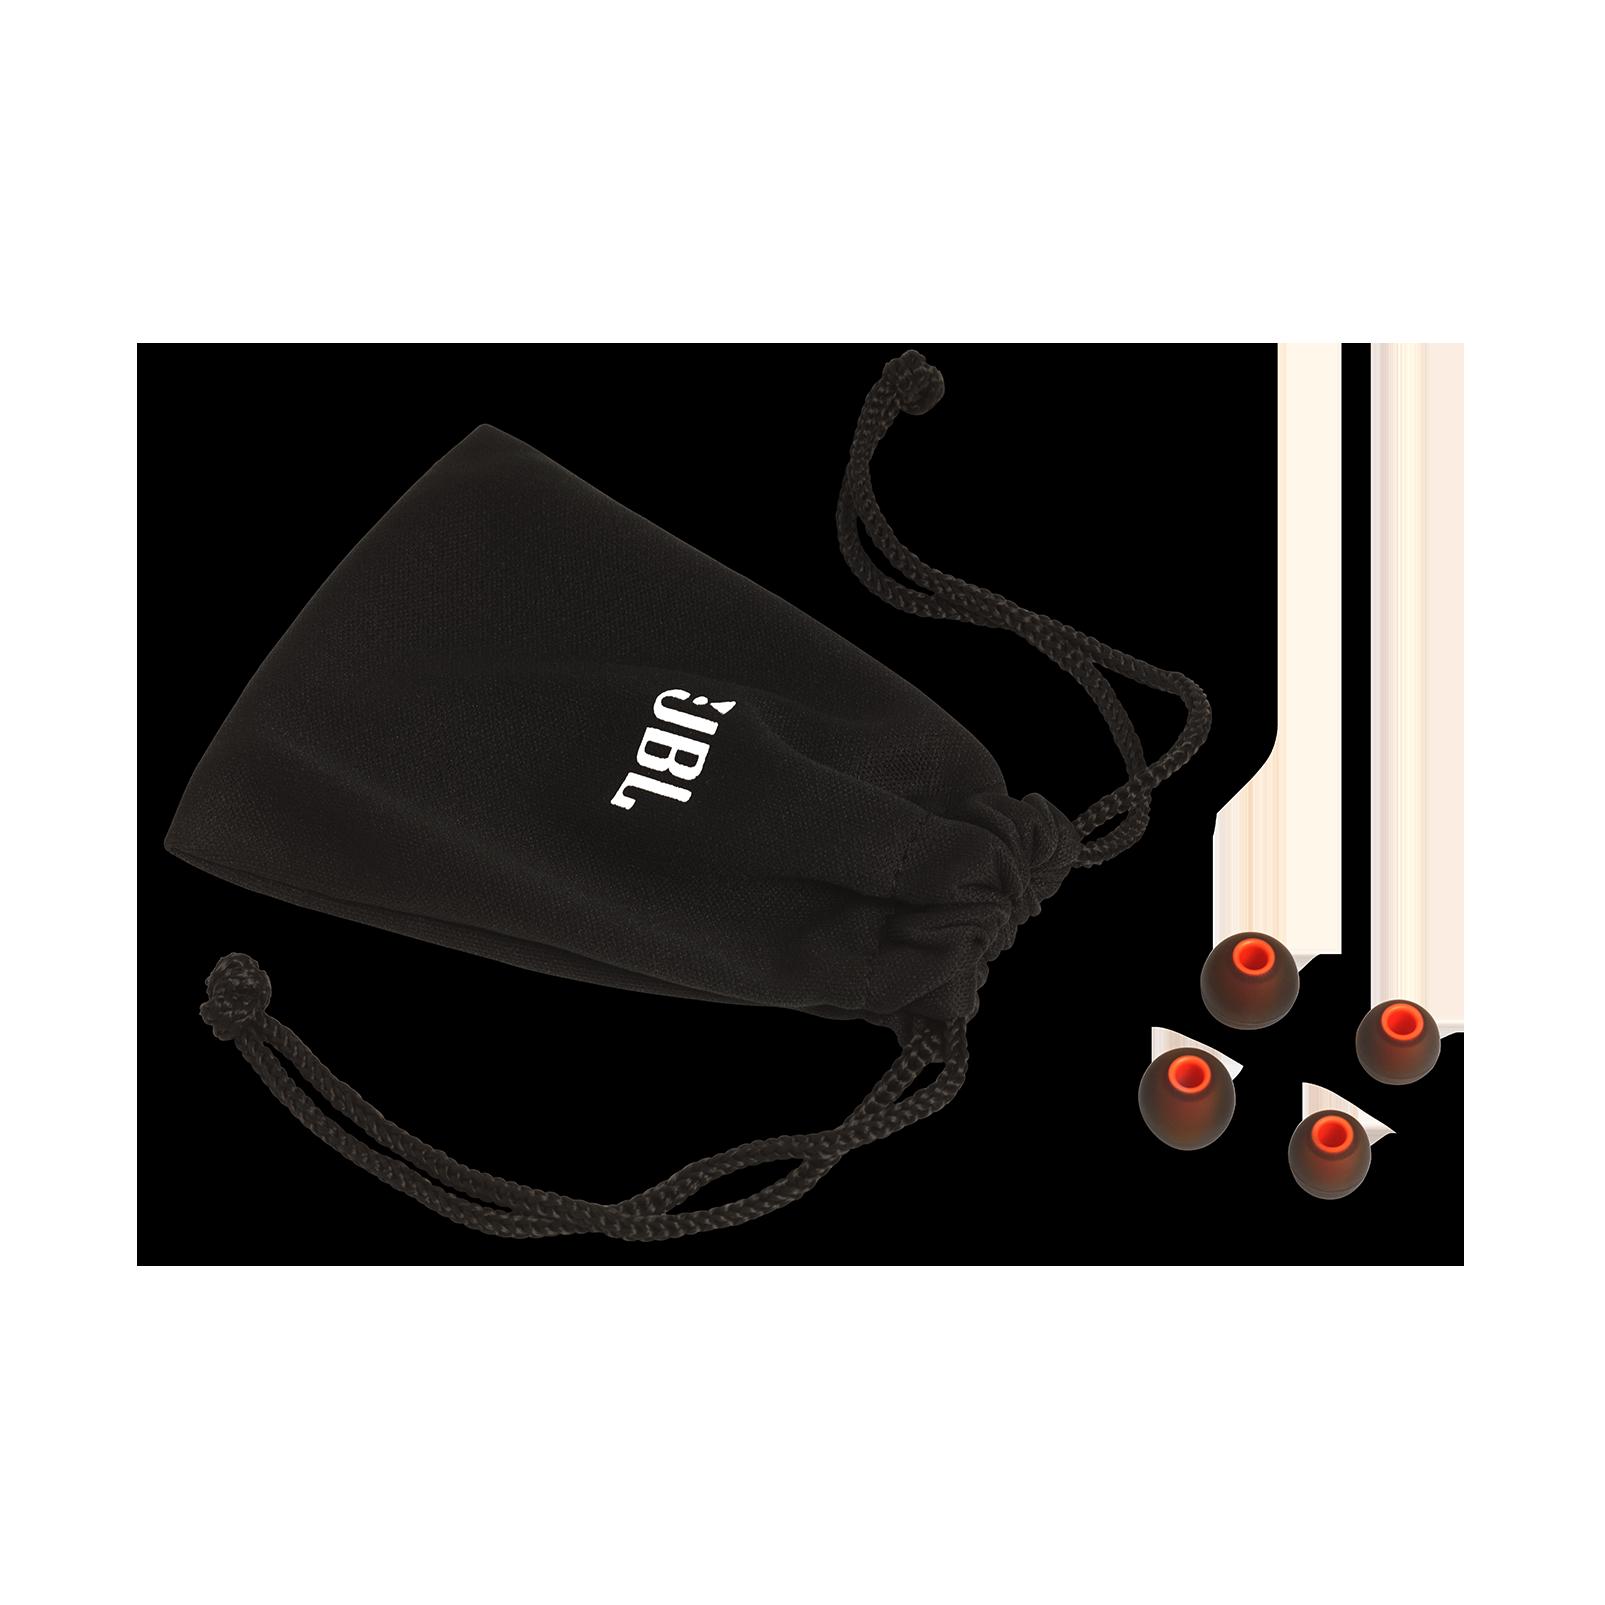 JBL TUNE 210 - Black - In-ear headphones - Detailshot 5